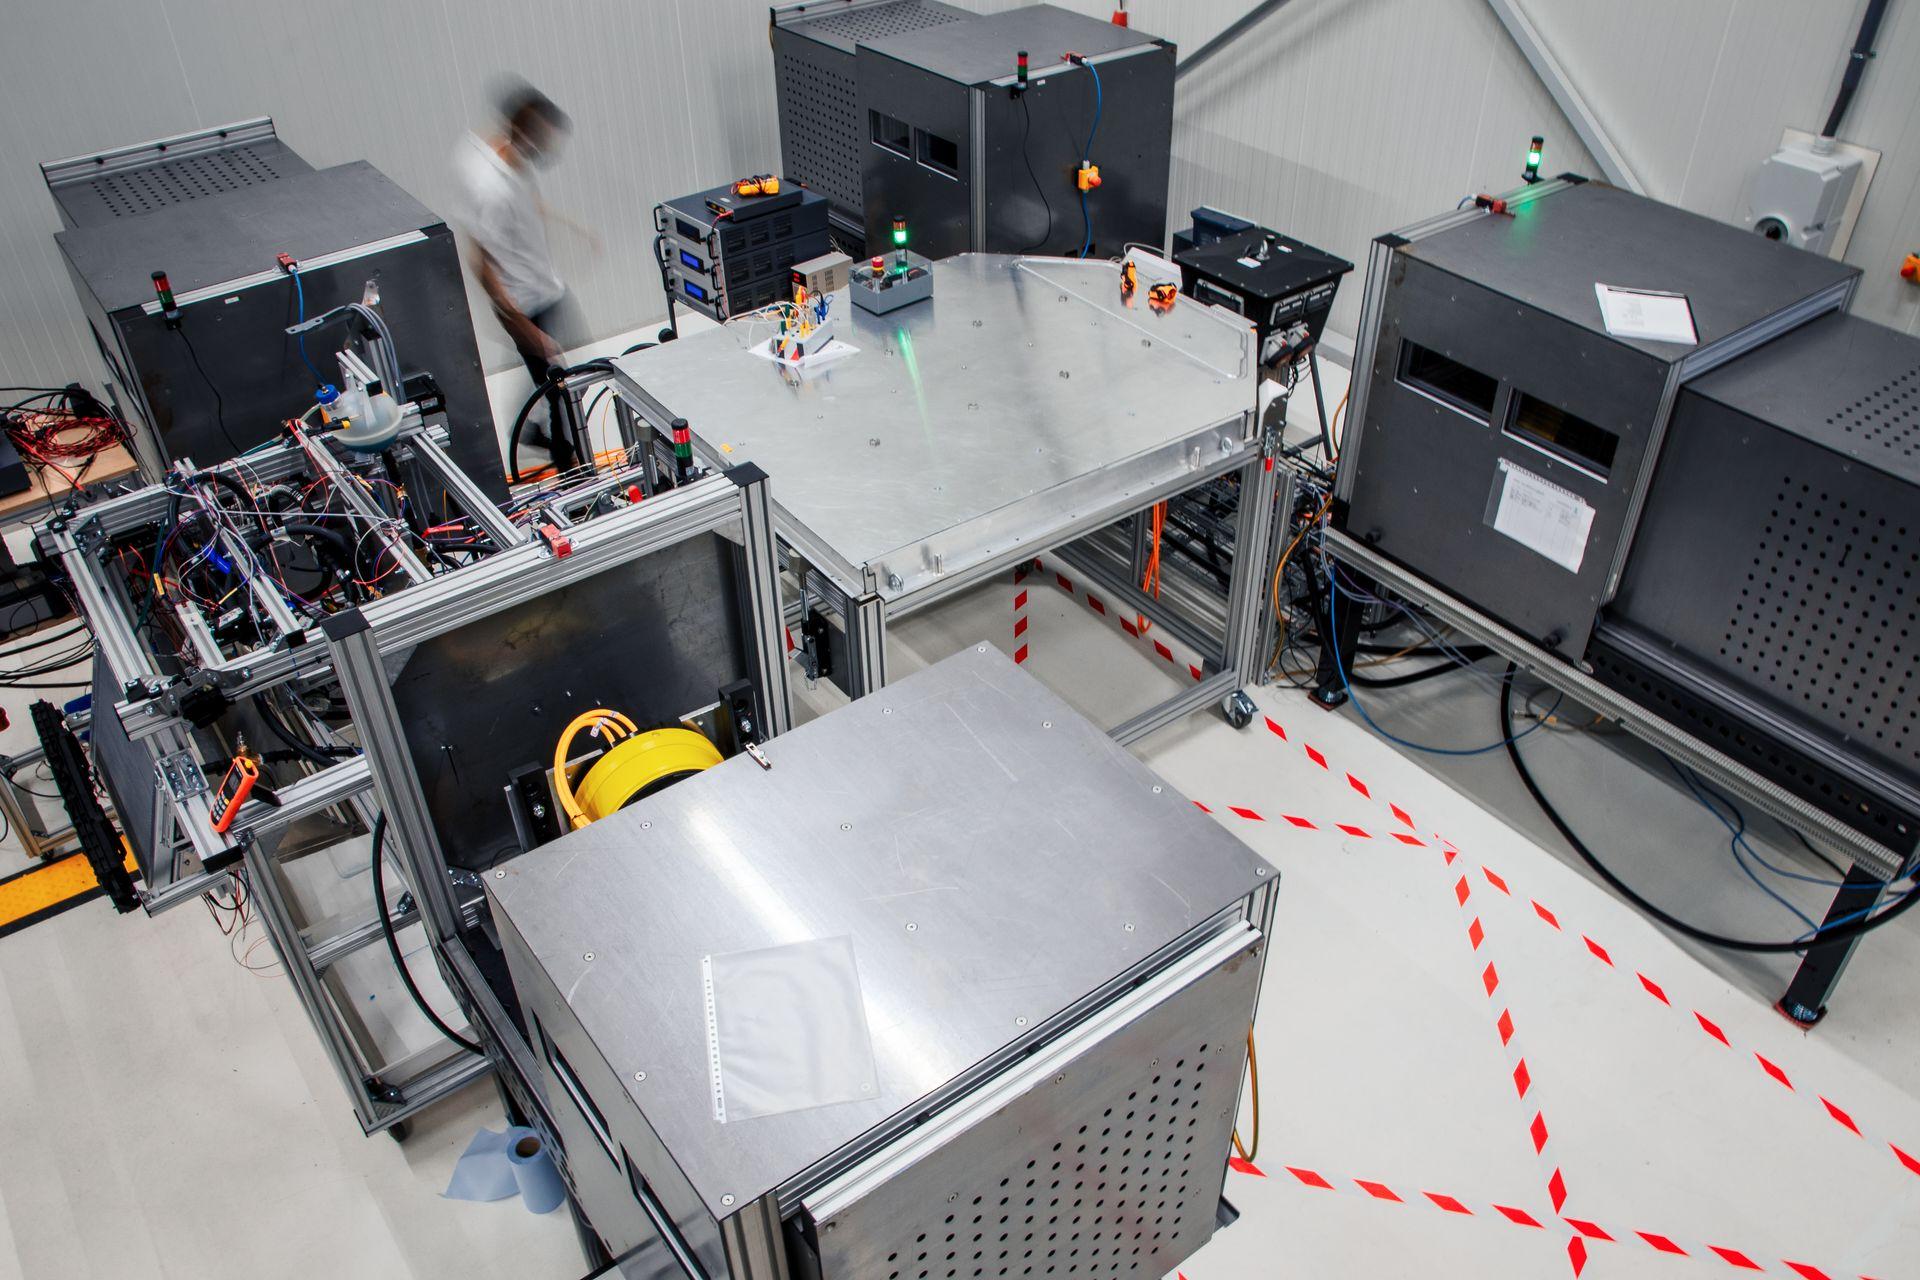 Lightyear One's Hardware Integration Test setup